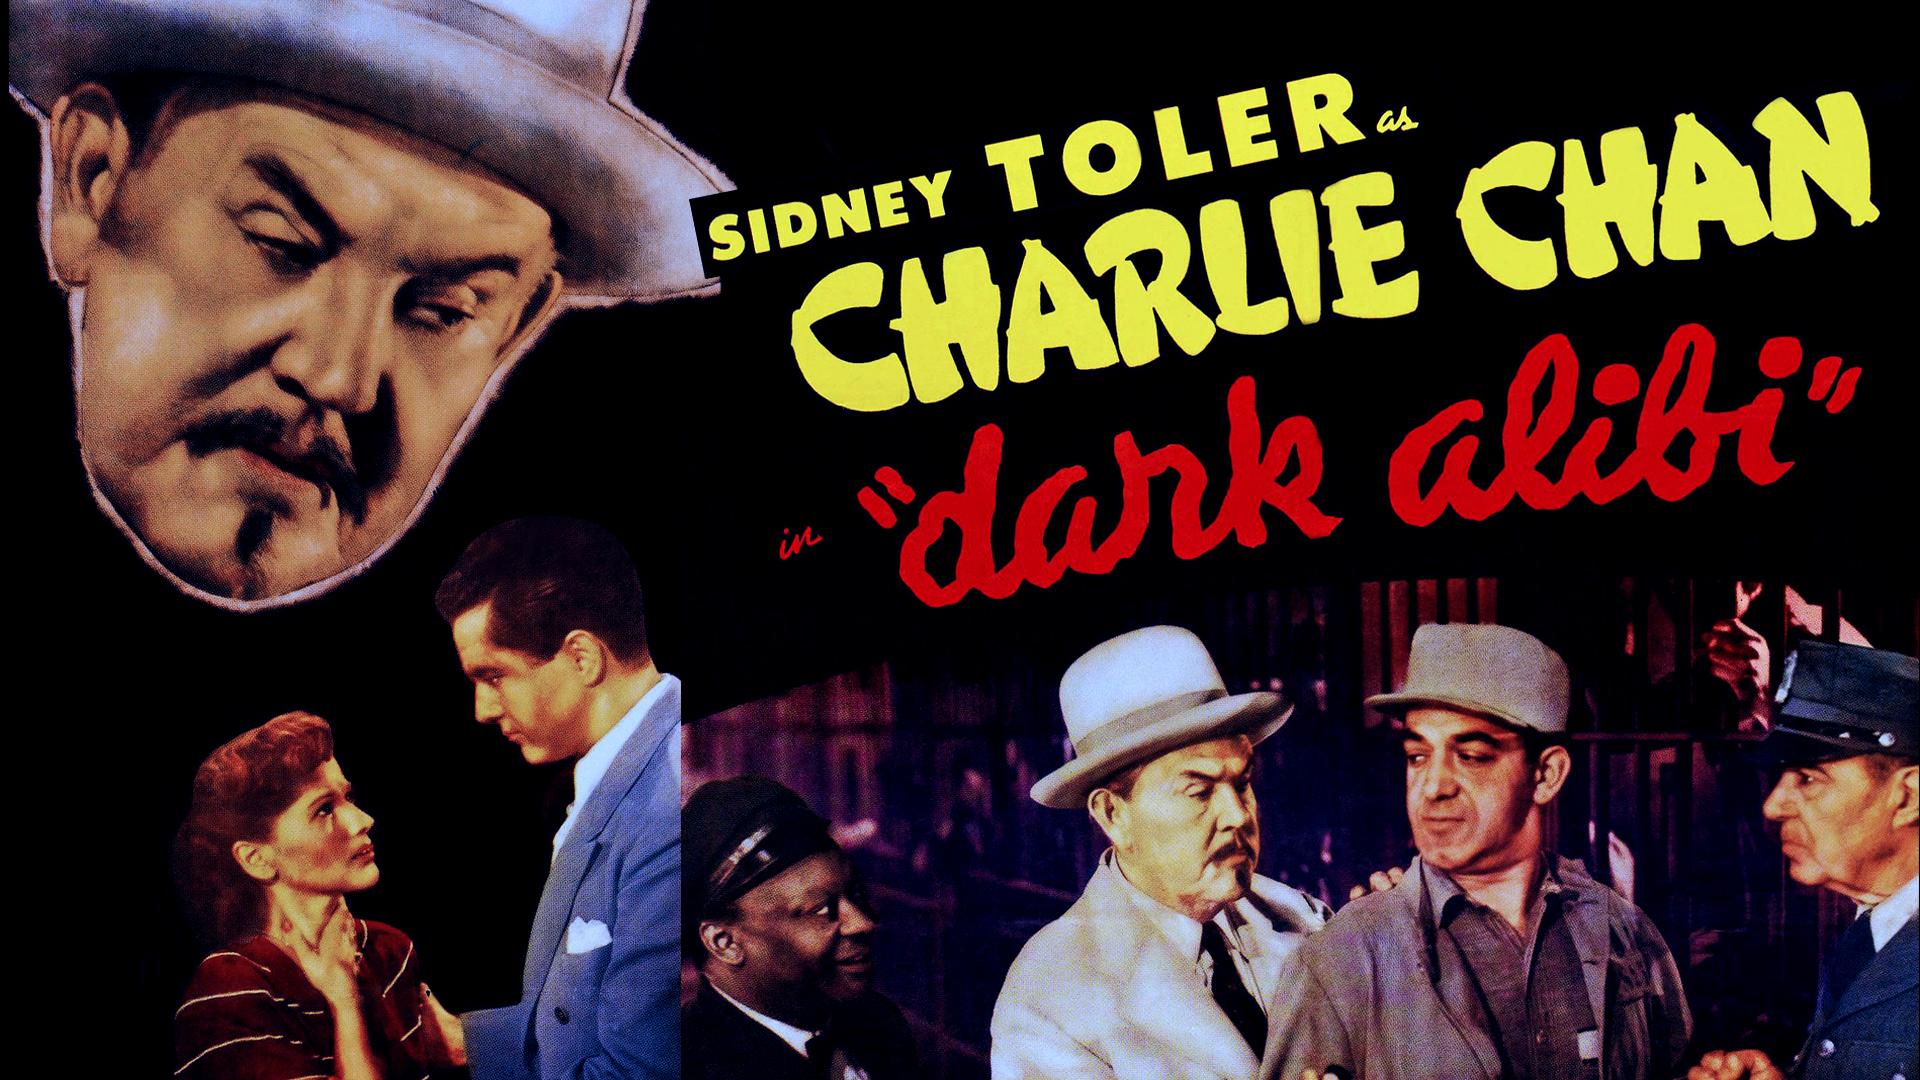 Dark Alibi - Sidney Toler As Charlie Chan